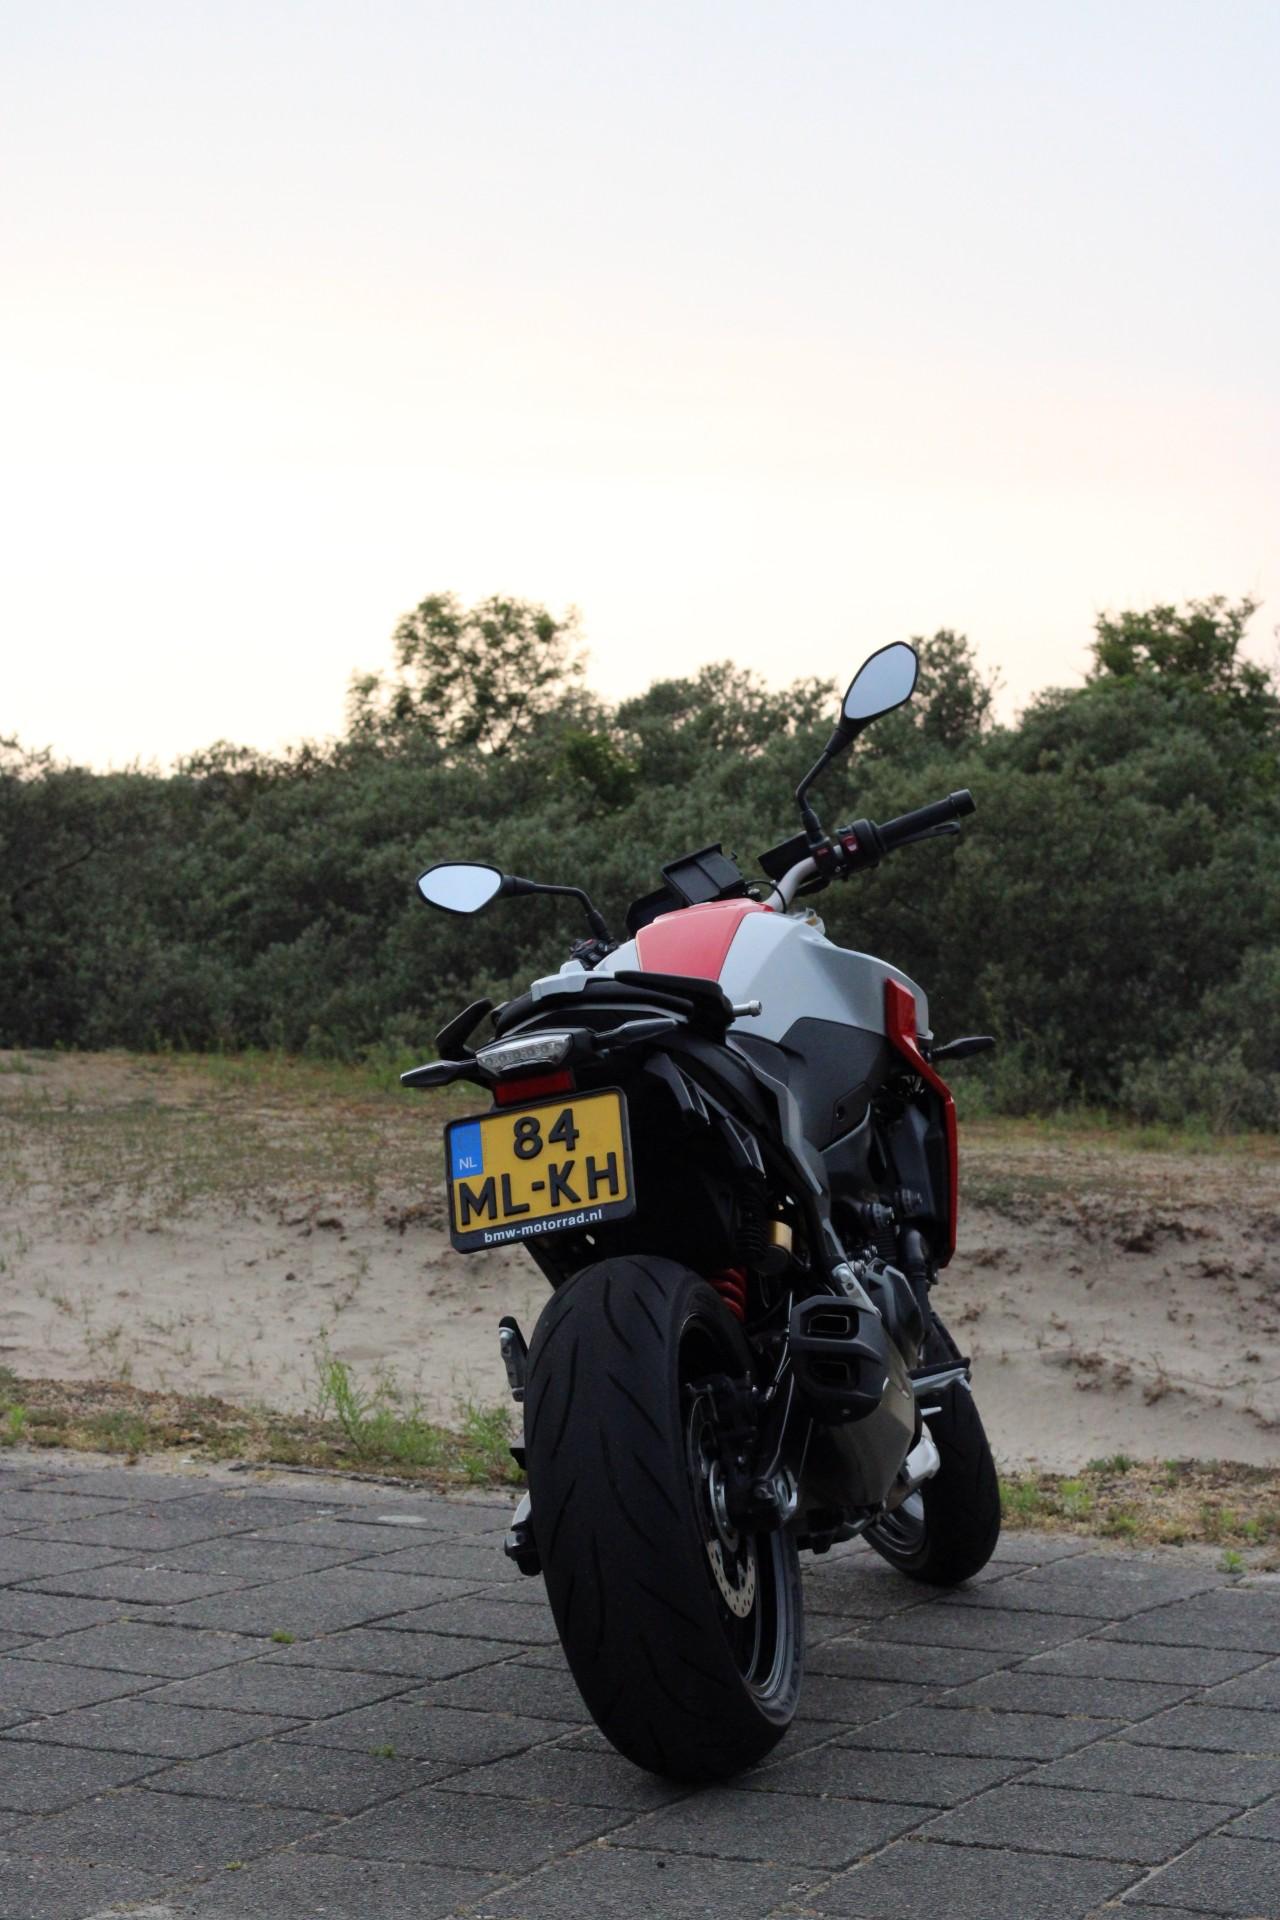 BMW F900R Naked Bike A2